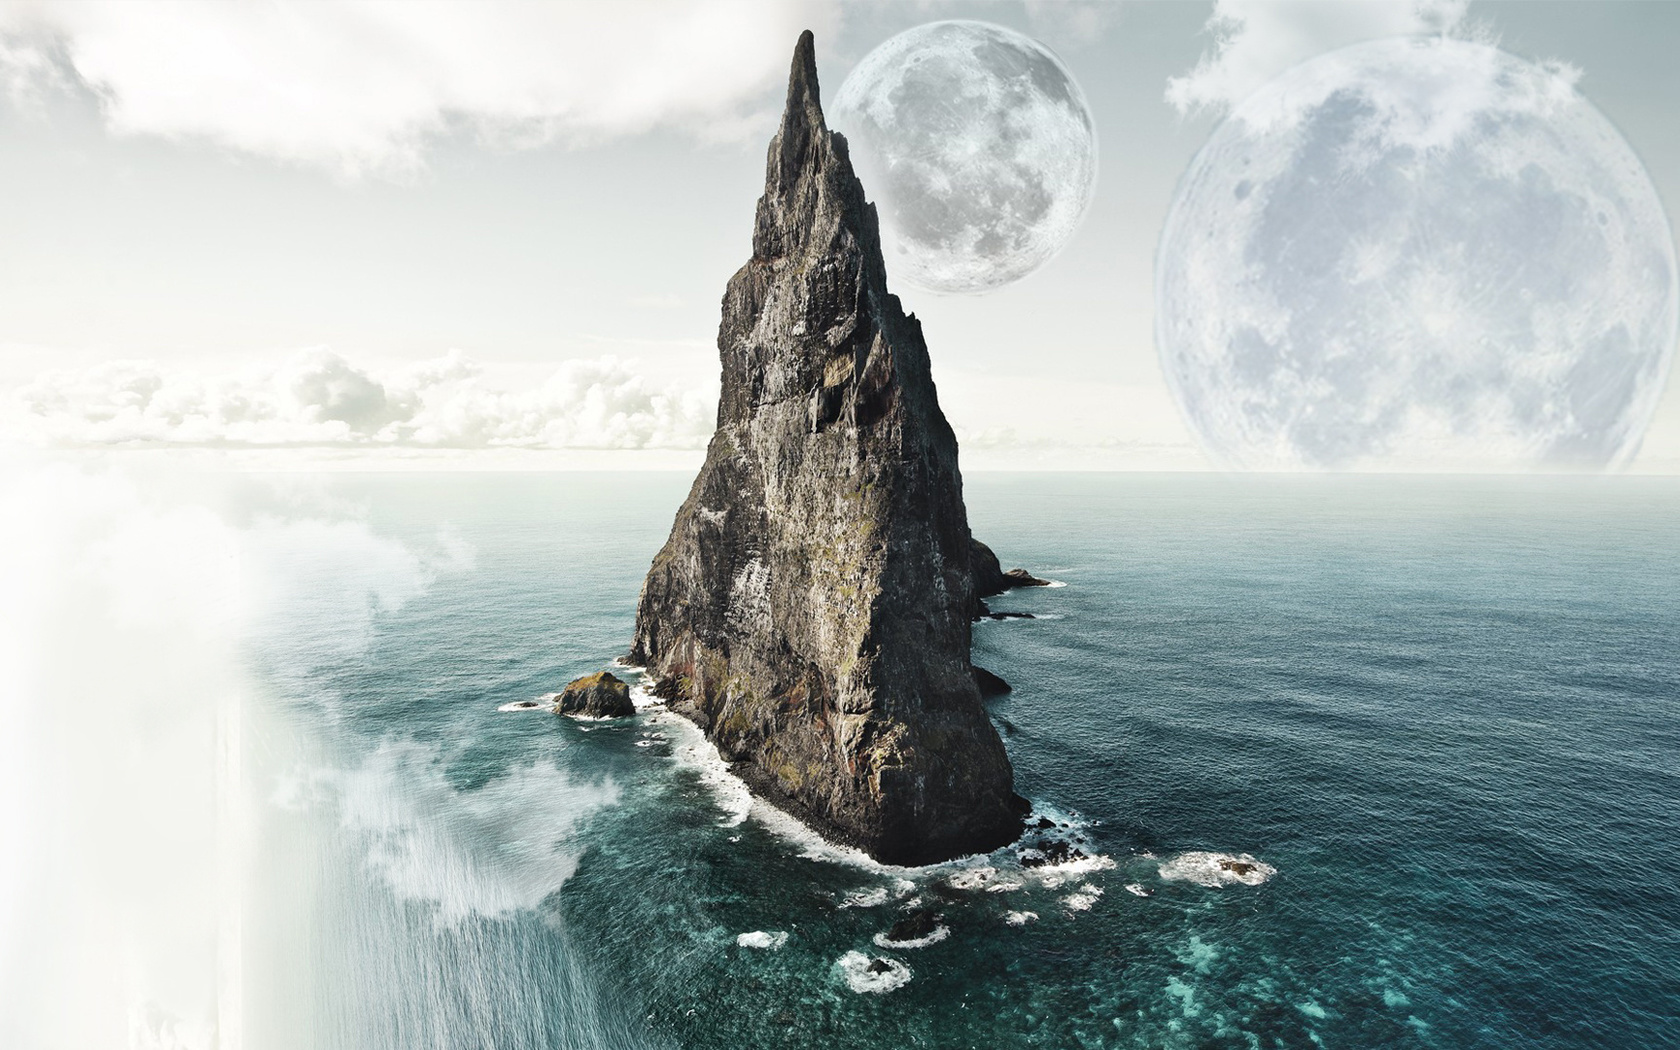 море, луна, скала, облака, небо, вода